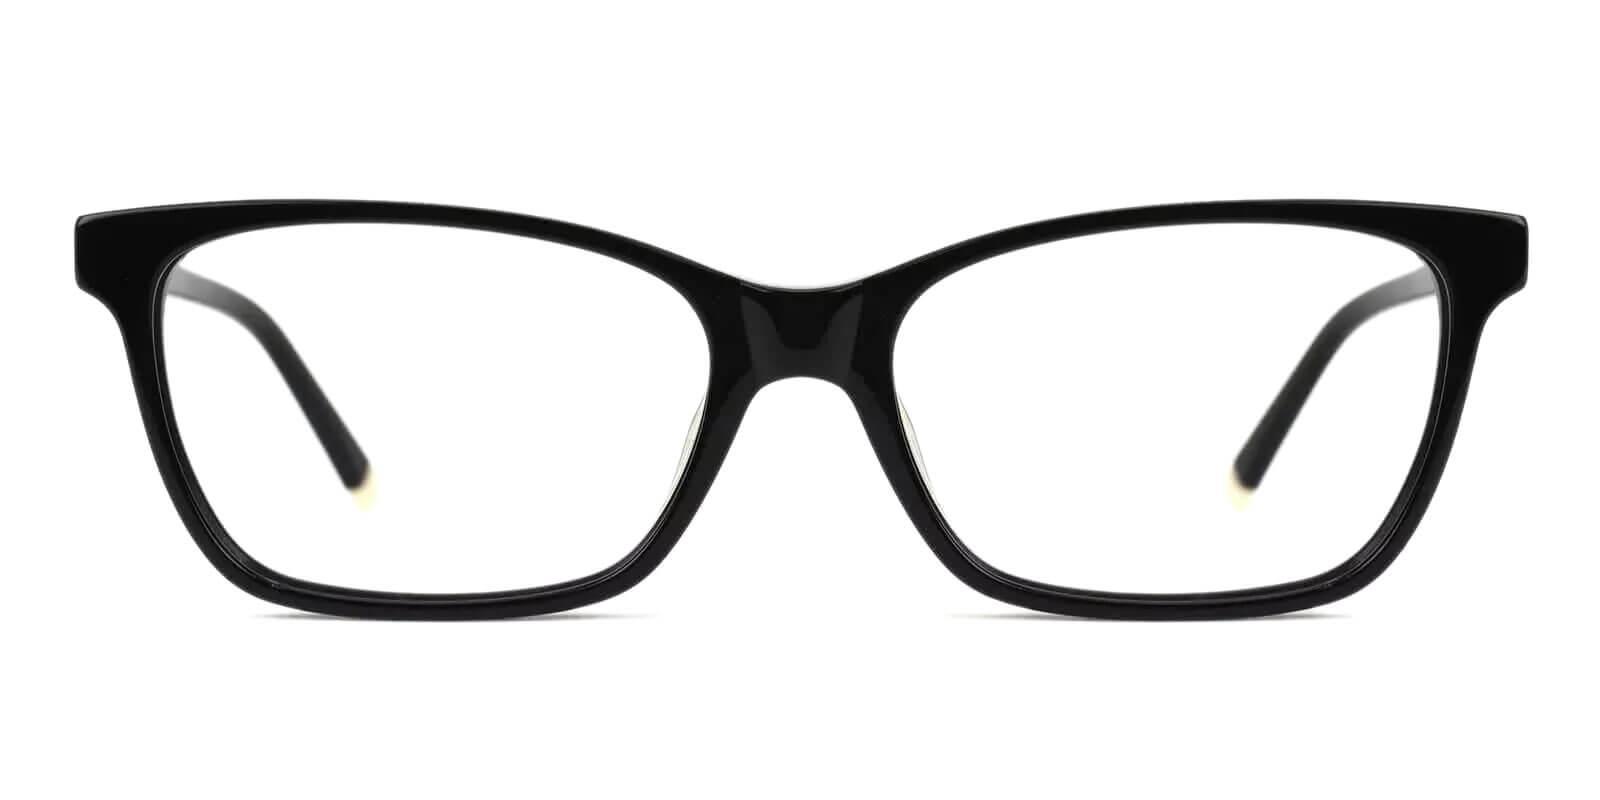 RingGold Black Acetate Eyeglasses , SpringHinges , UniversalBridgeFit Frames from ABBE Glasses